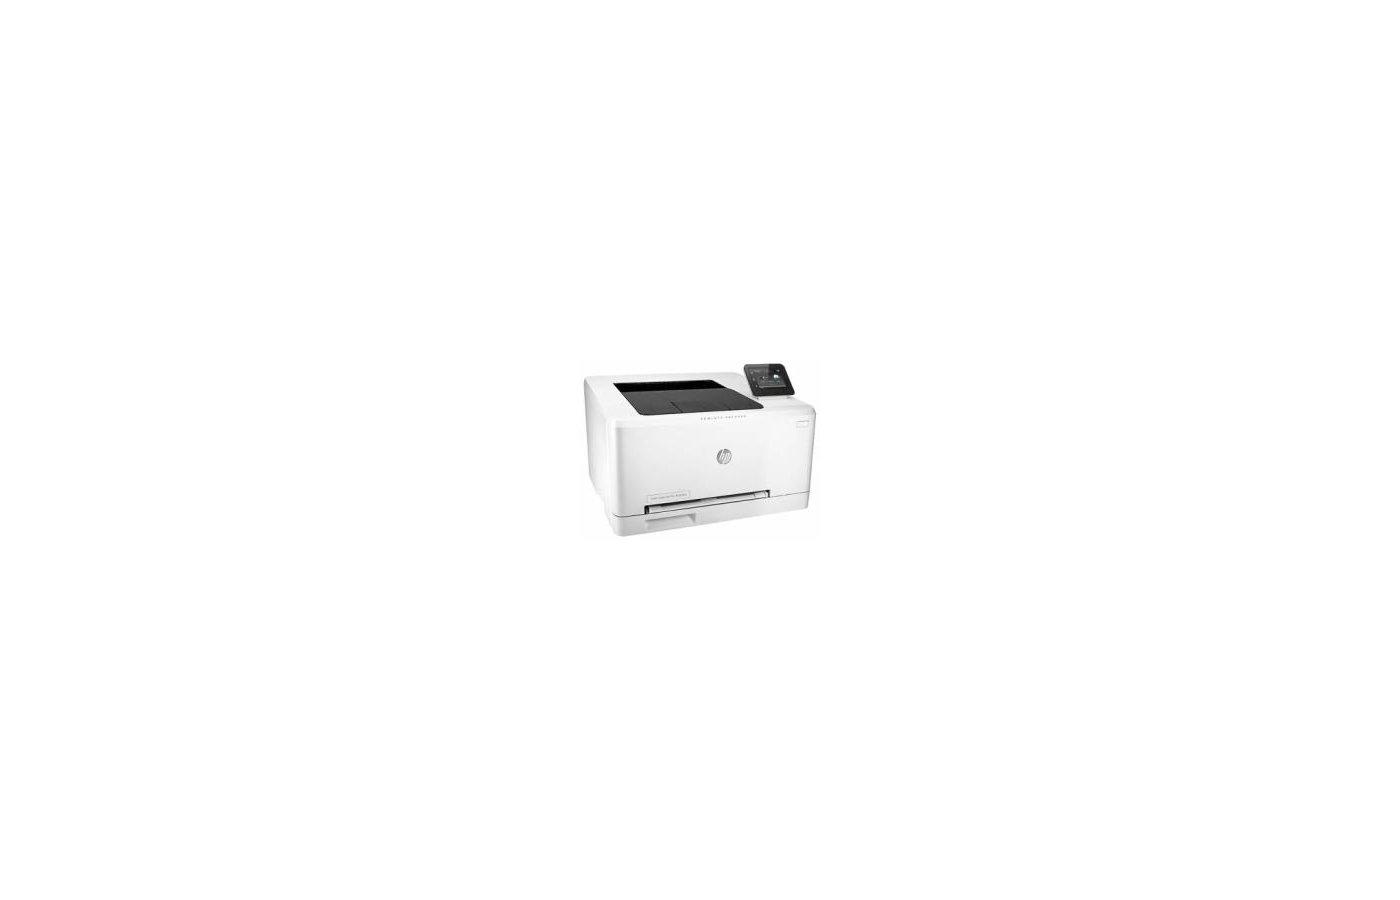 Принтер HP Color LaserJet Pro M252dw /B4A22A/ A4 Duplex WiFi